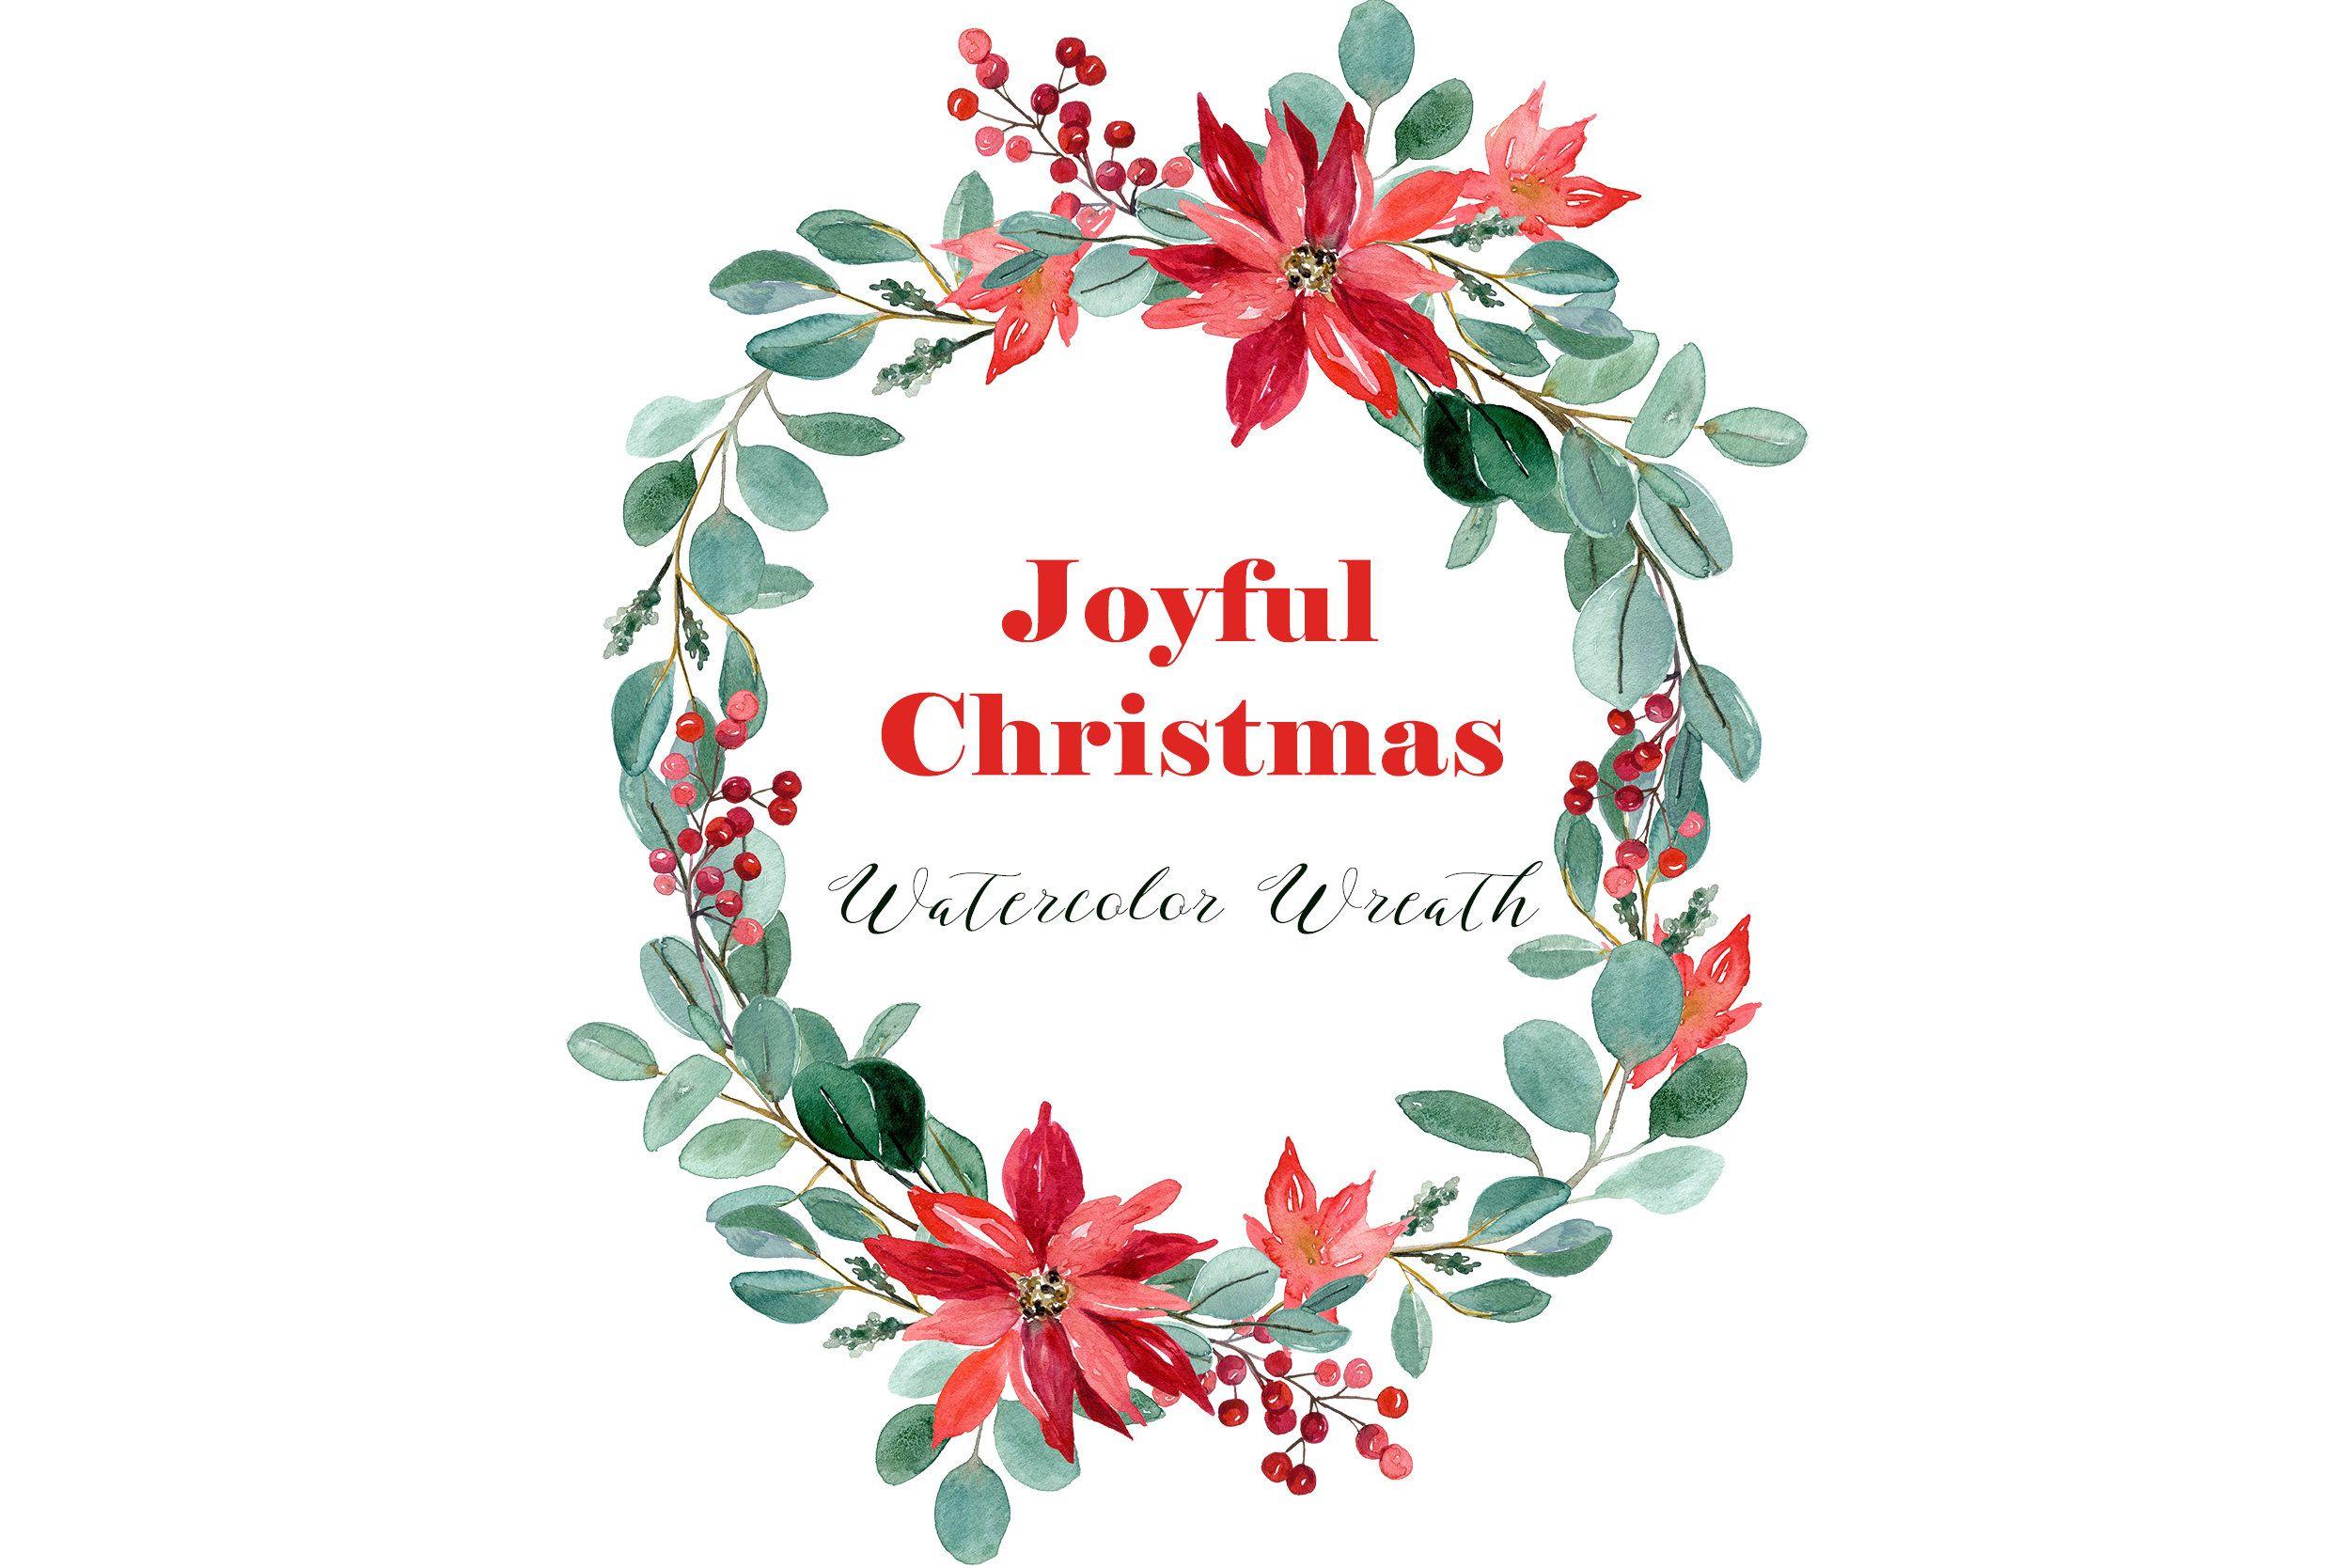 Joyful Christmas Watercolor Wreath Png Watercolour Etsy Christmas Watercolor Wreath Watercolor Christmas Clipart